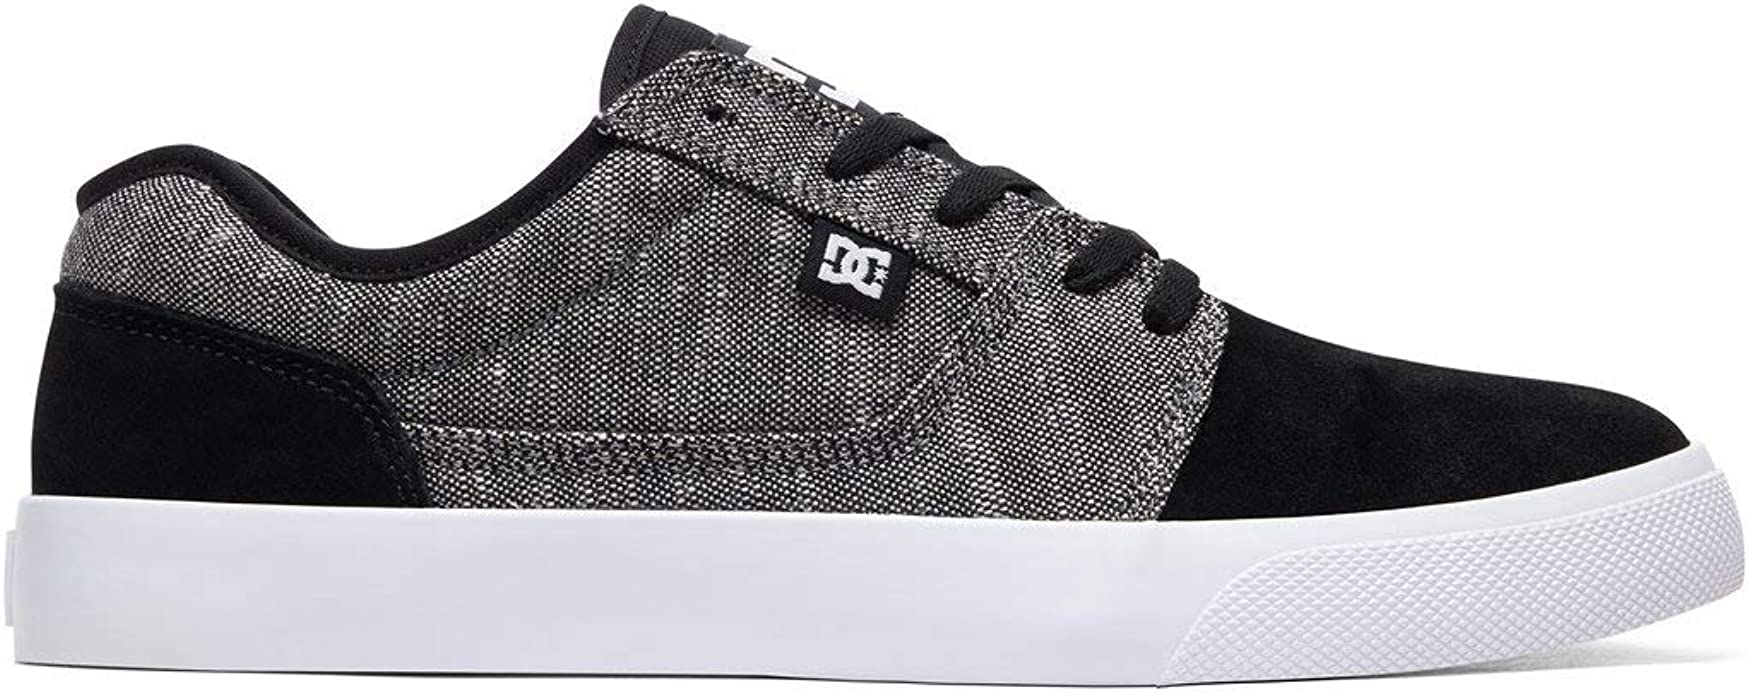 DC Shoes Tonik TX SE Sneakers Skateschuhe Herren Schwarz/Grau/Weiß (Black/Battleship/White)